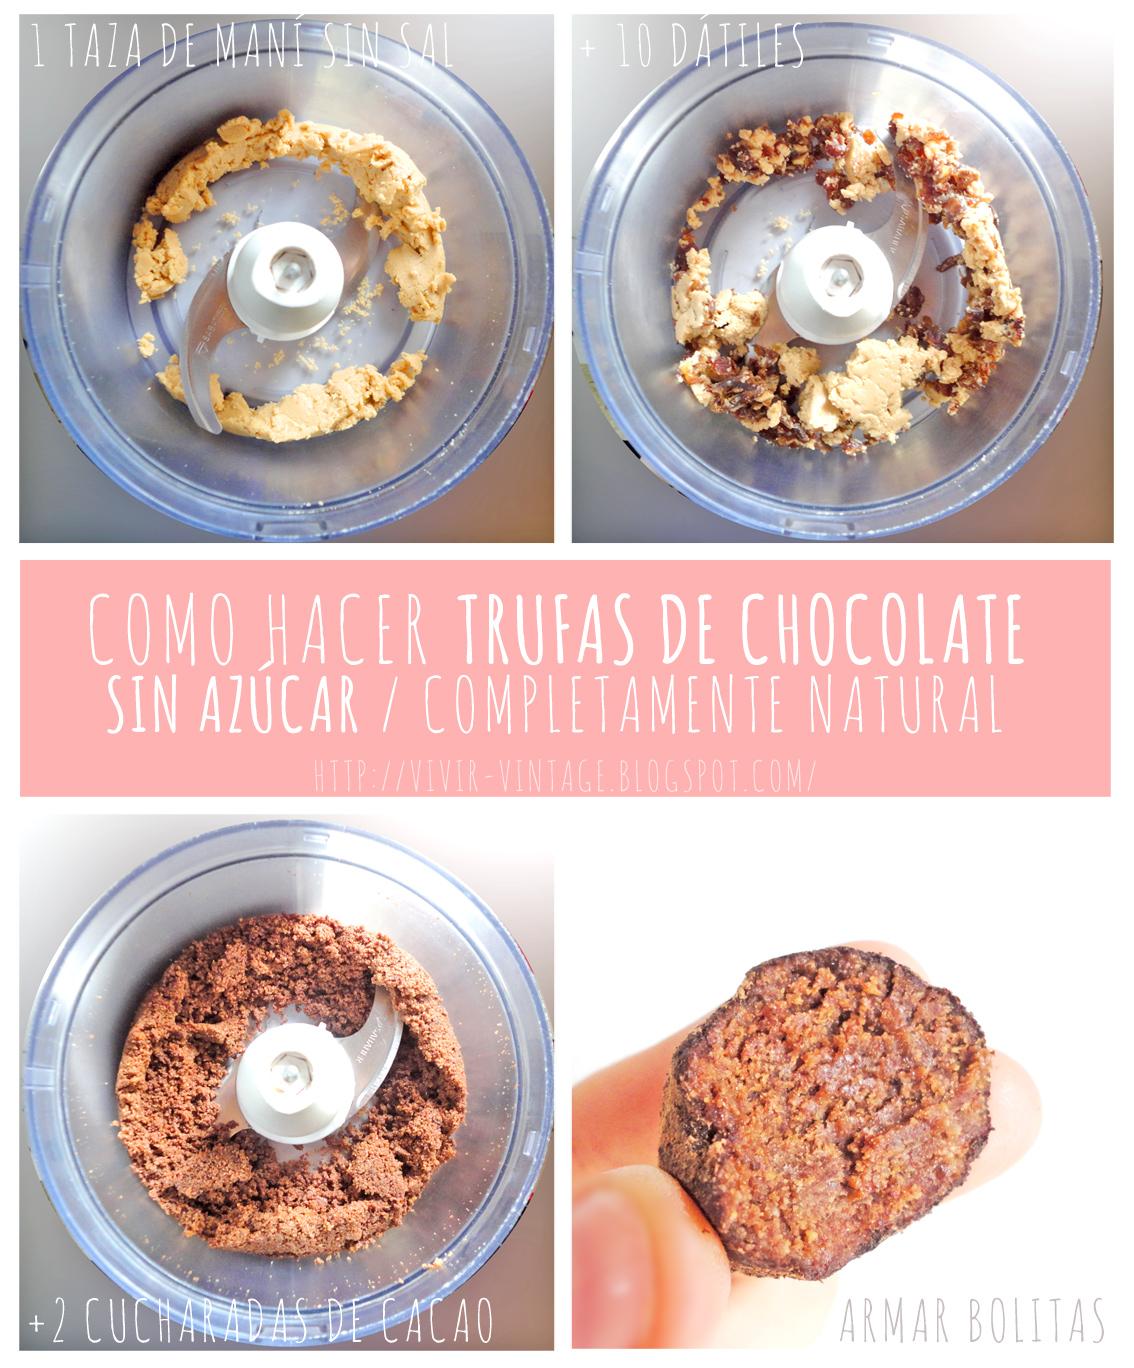 trufas de chocolate sanas sin azucar